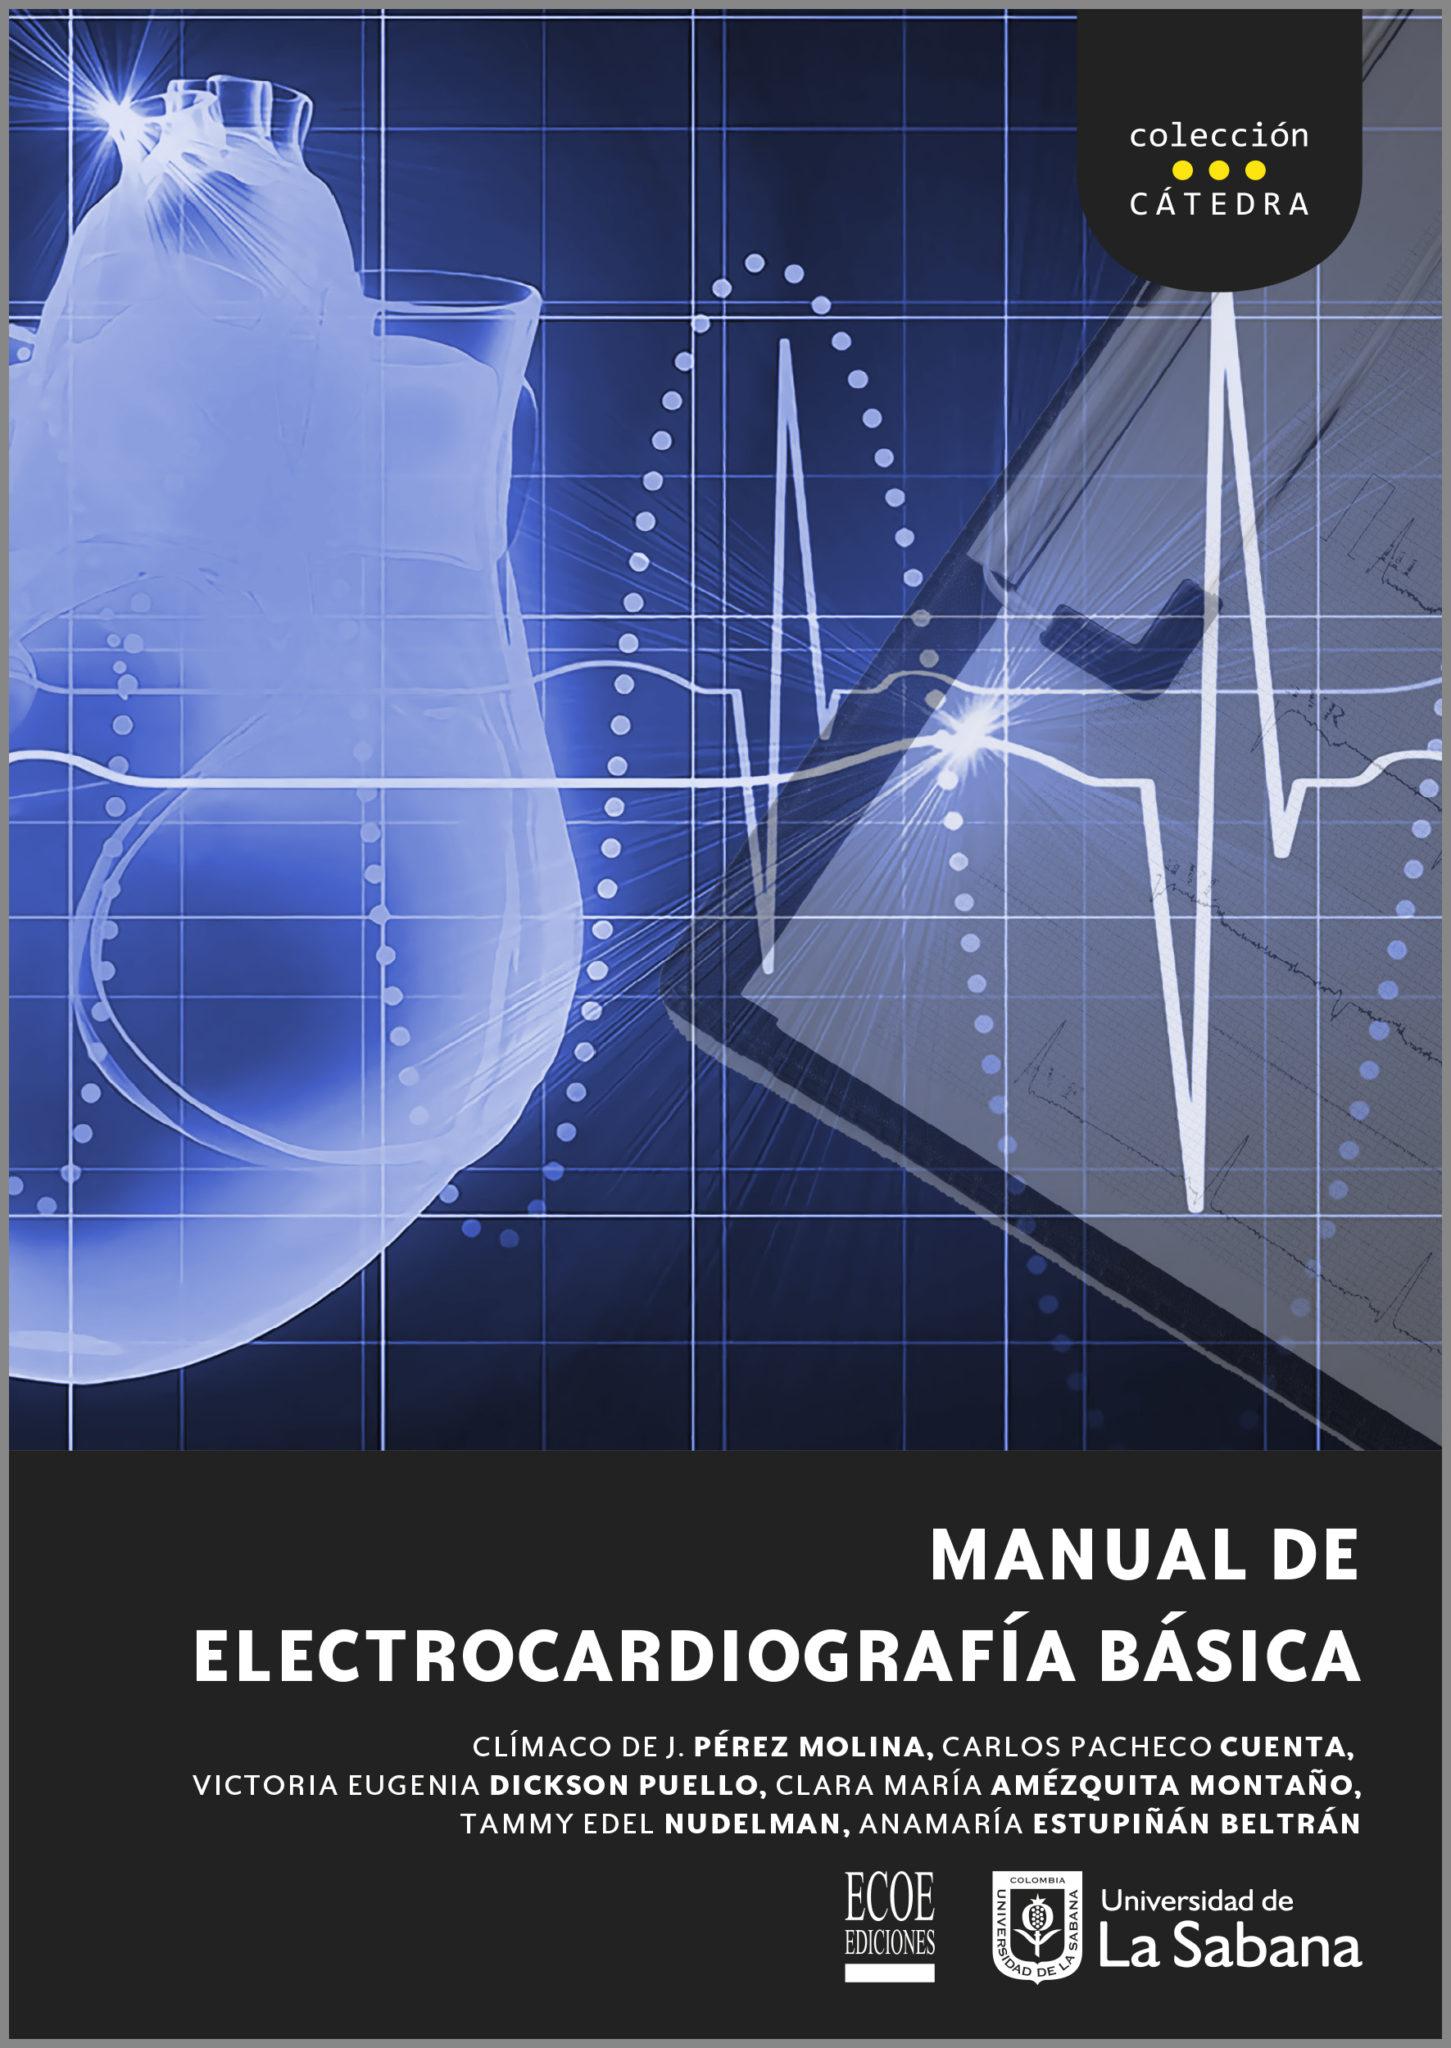 Manual de Electrocardiografía Básica. Colección Cátedra.